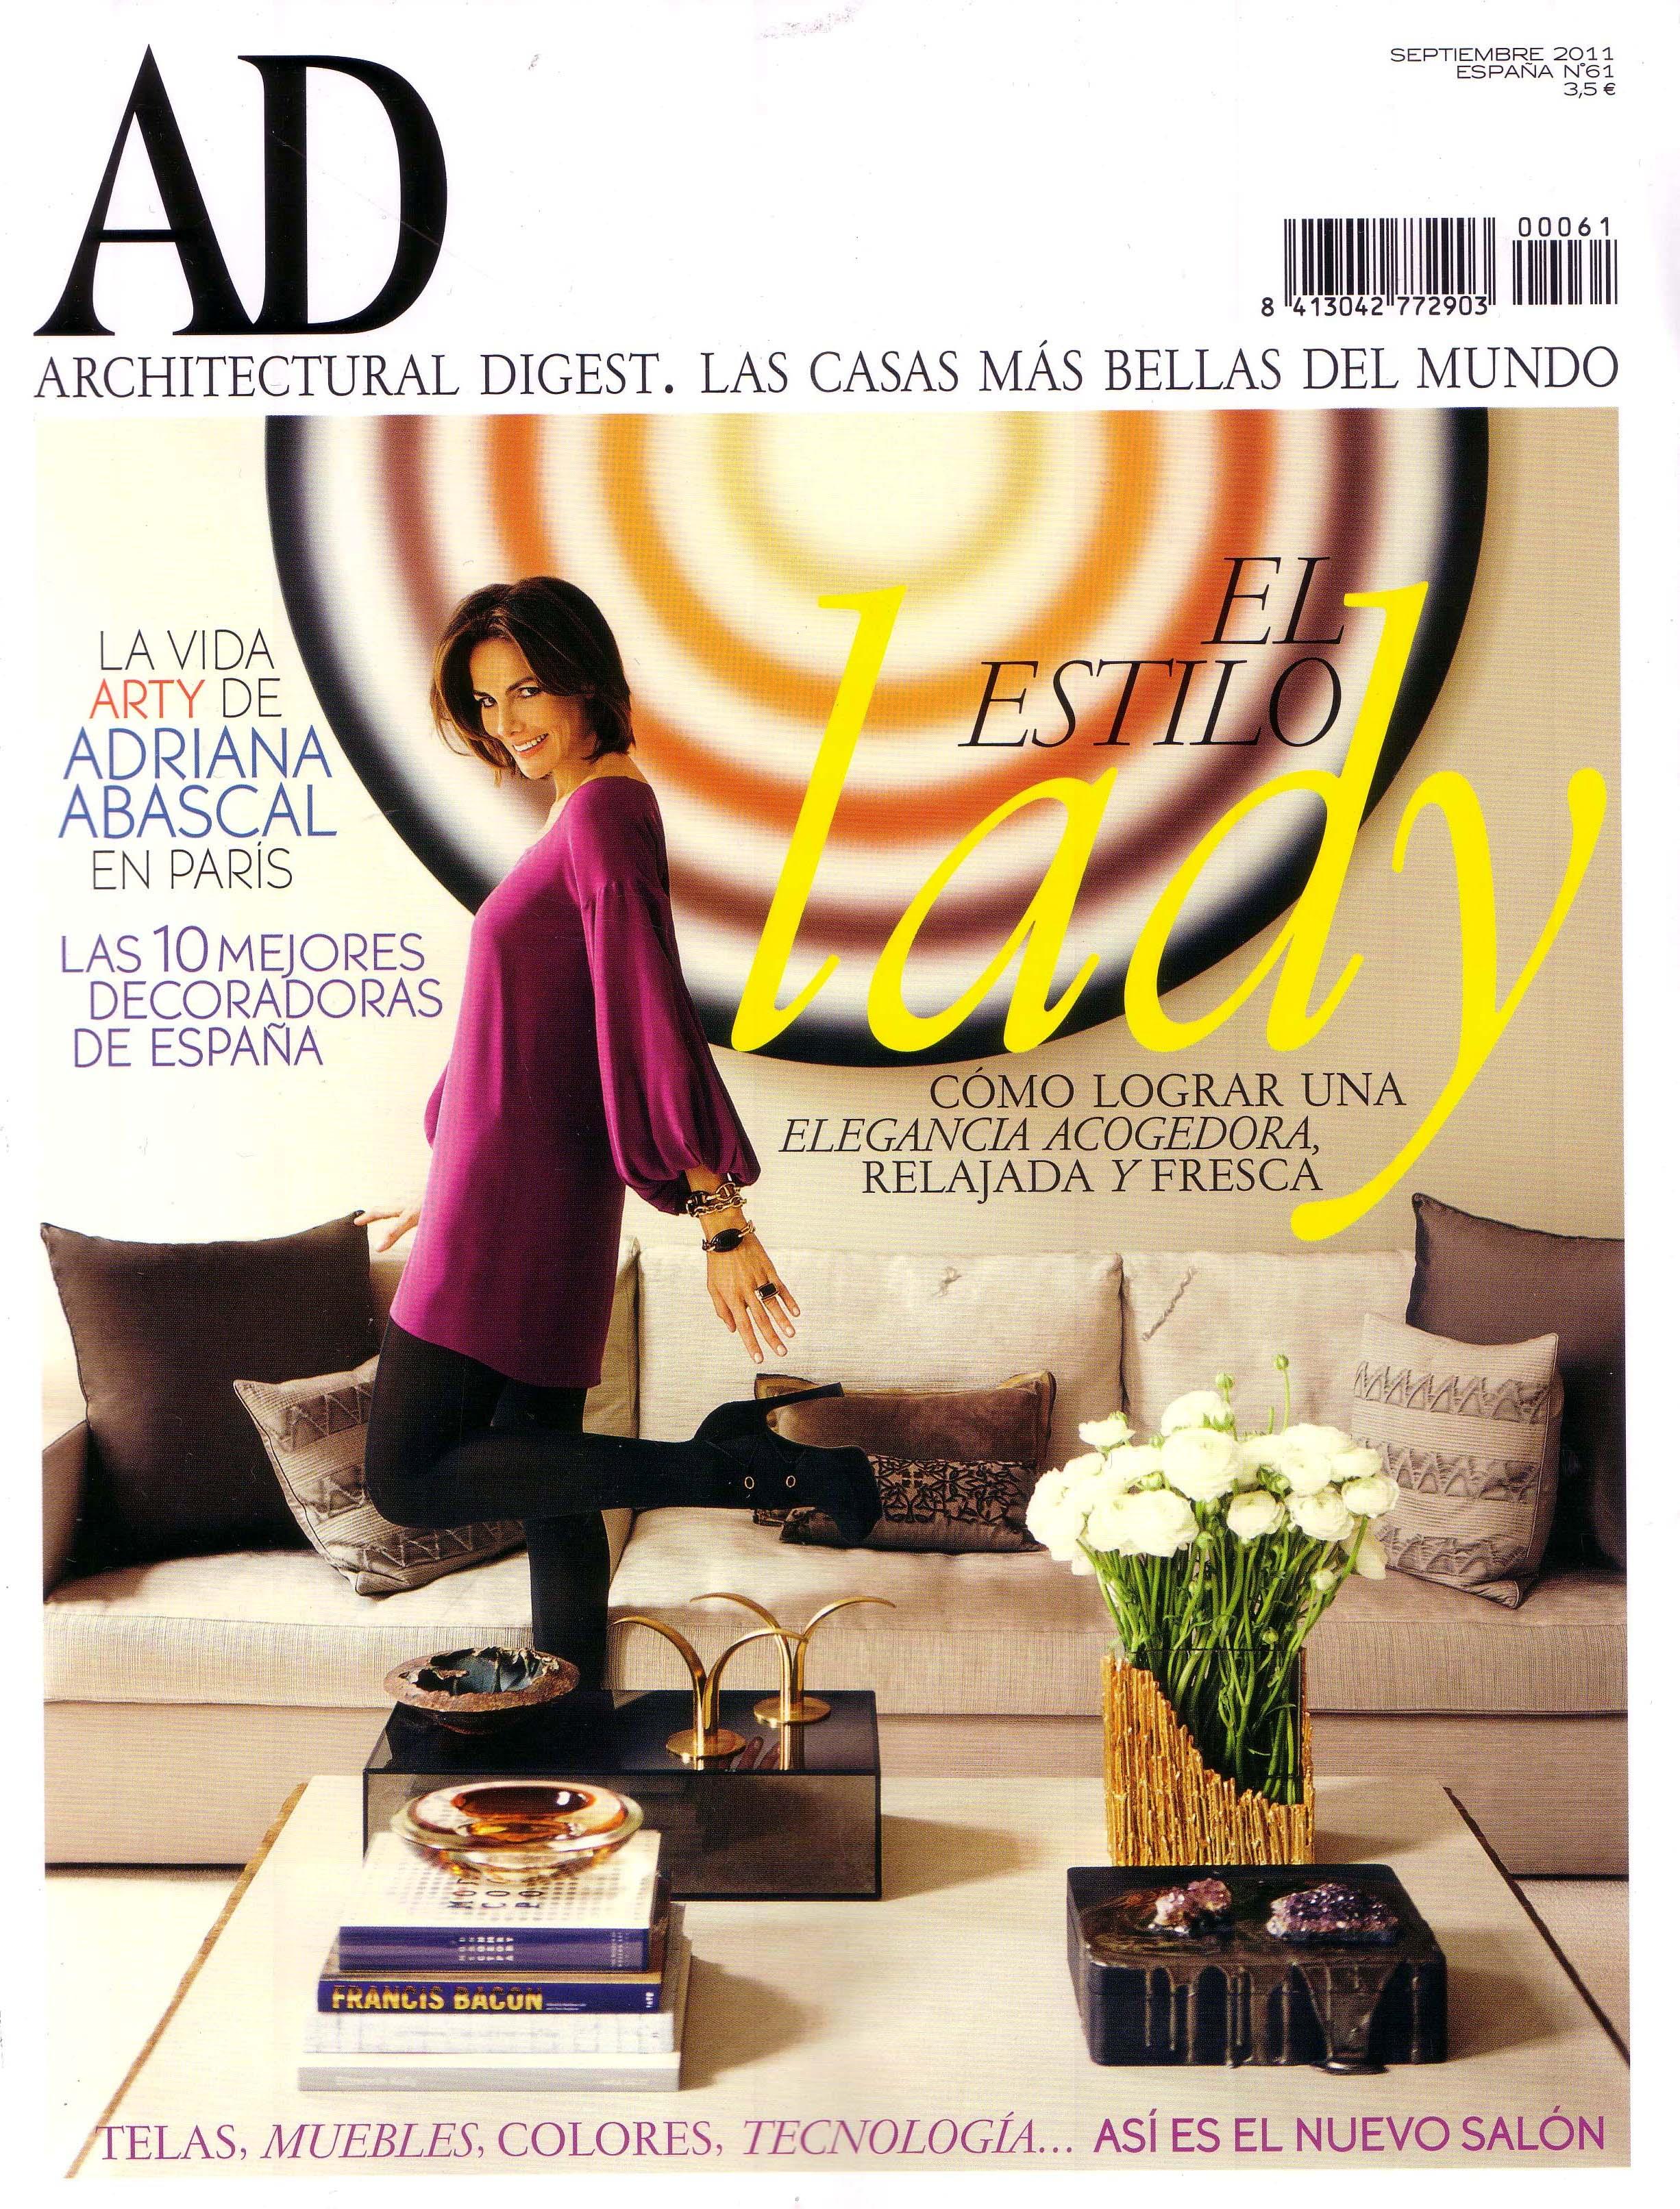 revista-ad-melian_randolph-septiembre-2011-portada-0